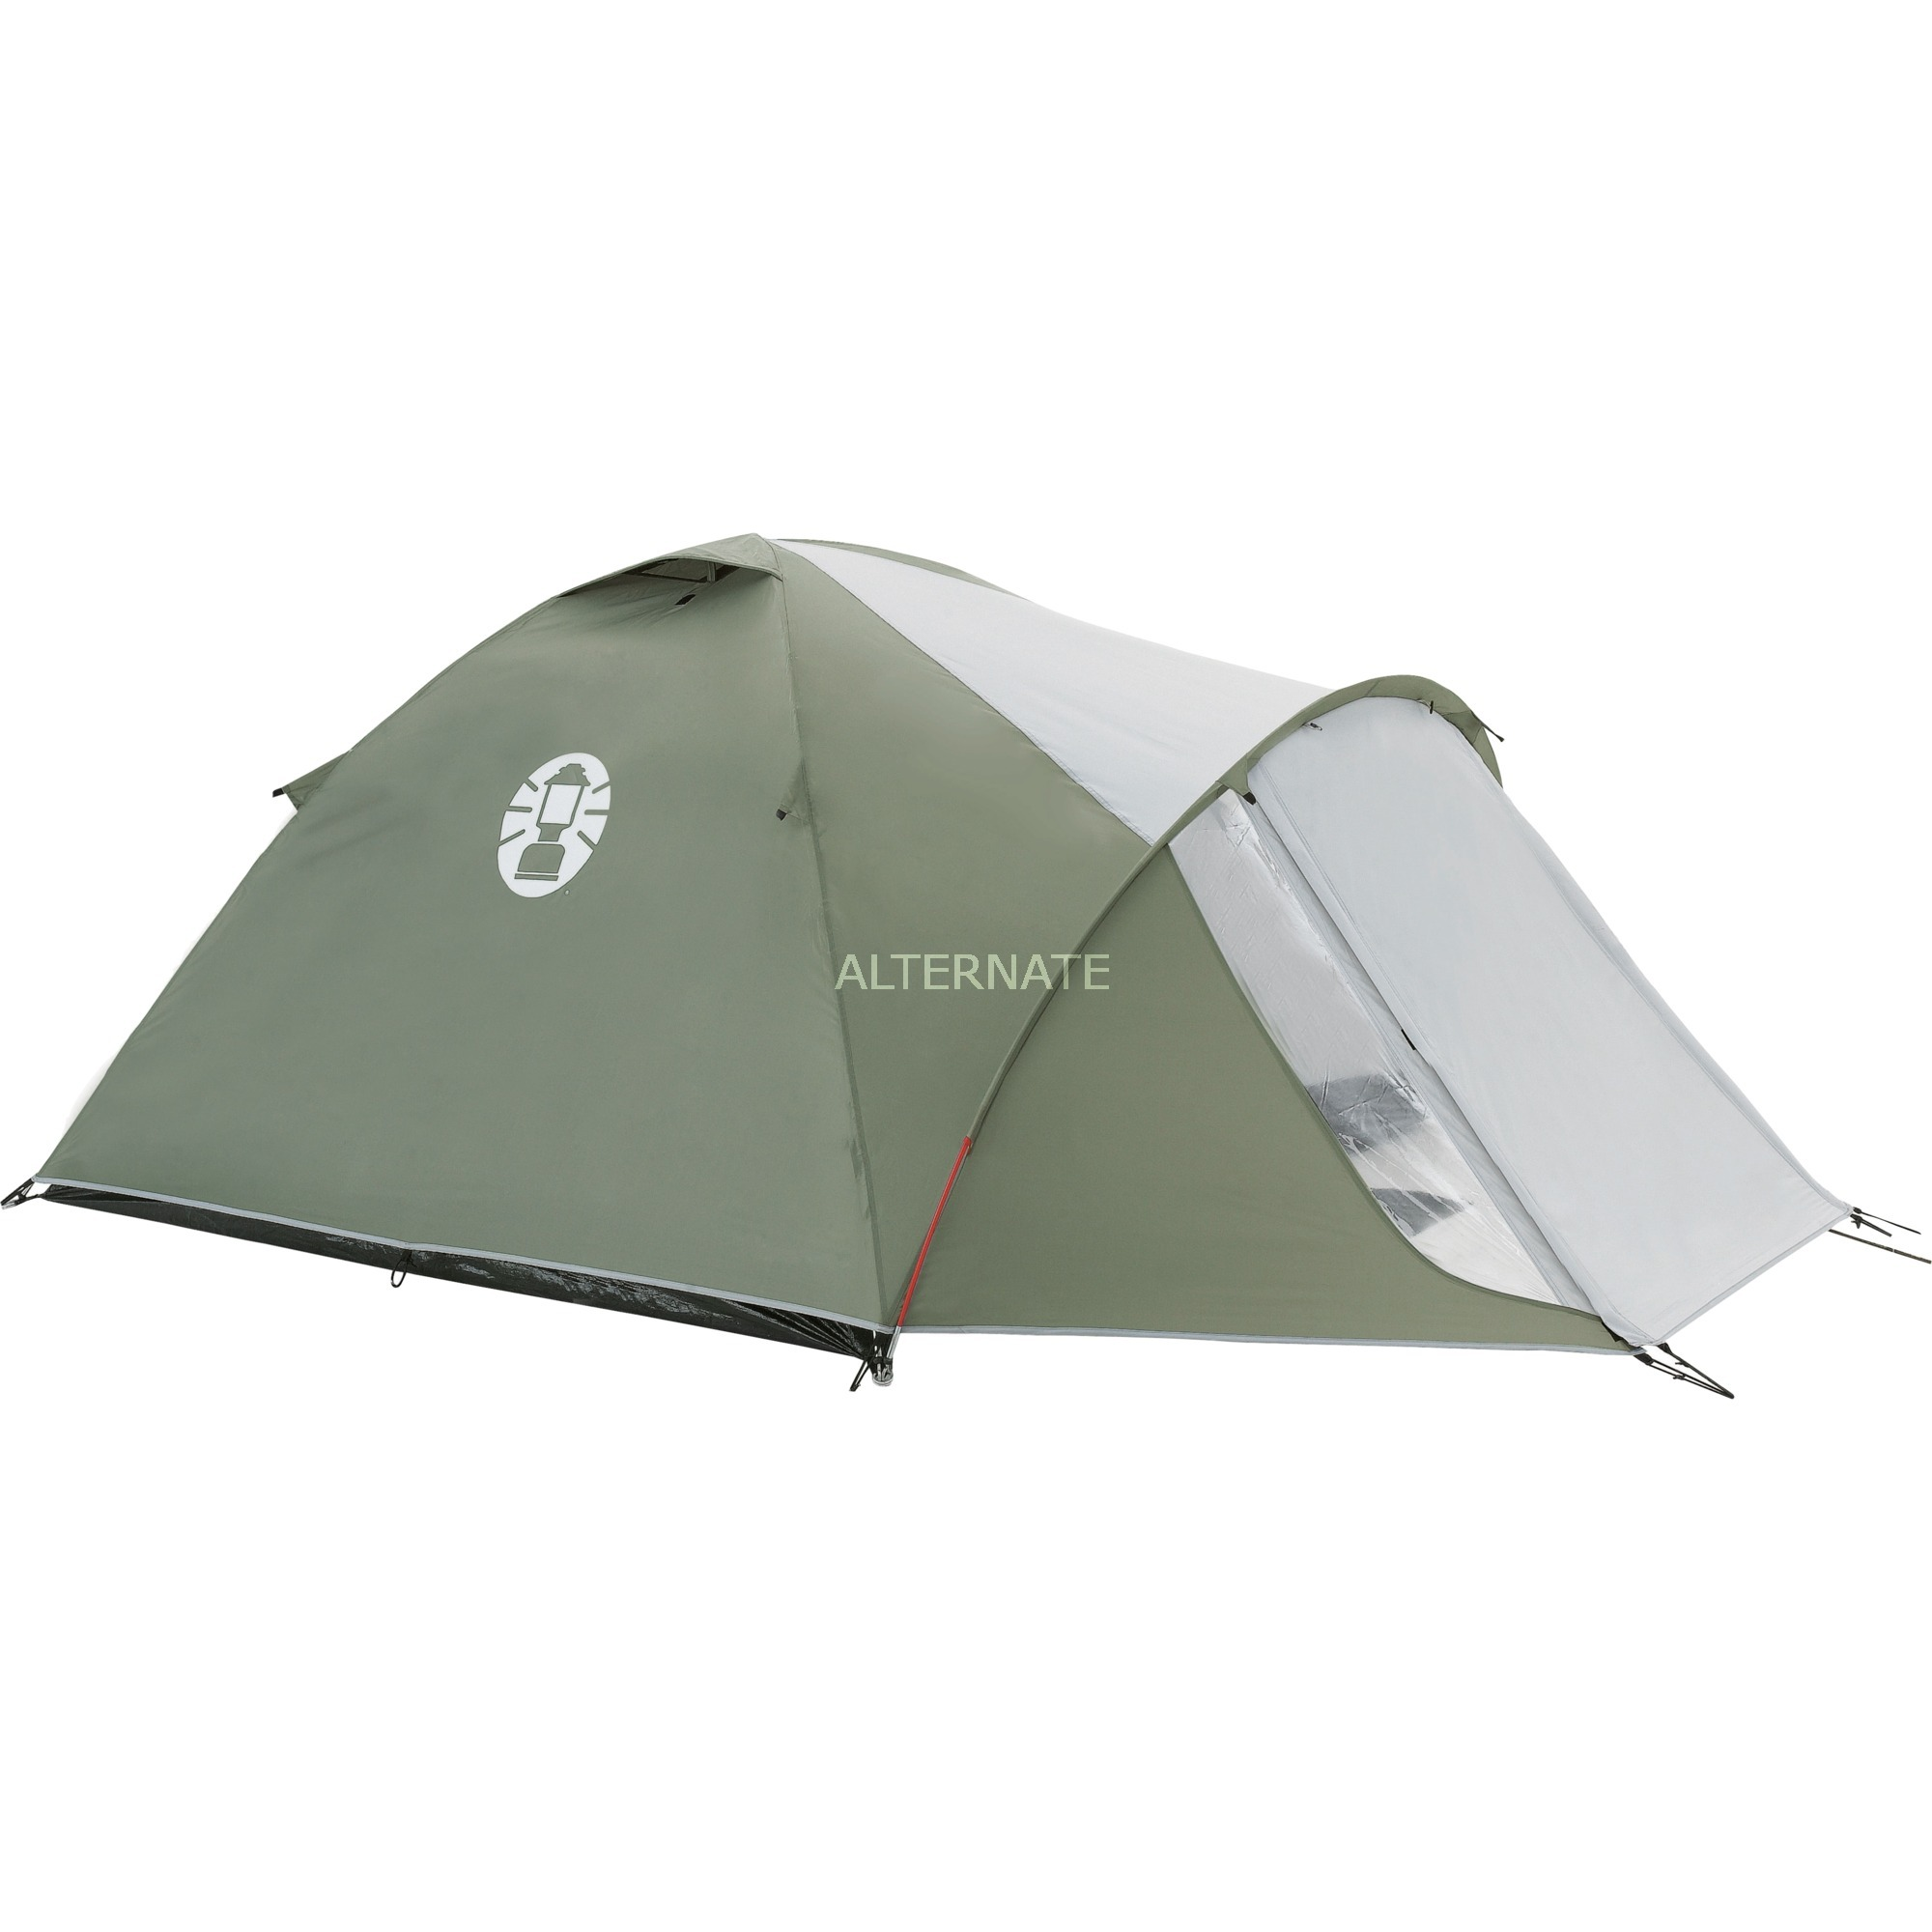 crestline-3-kupeligloo-telt-3